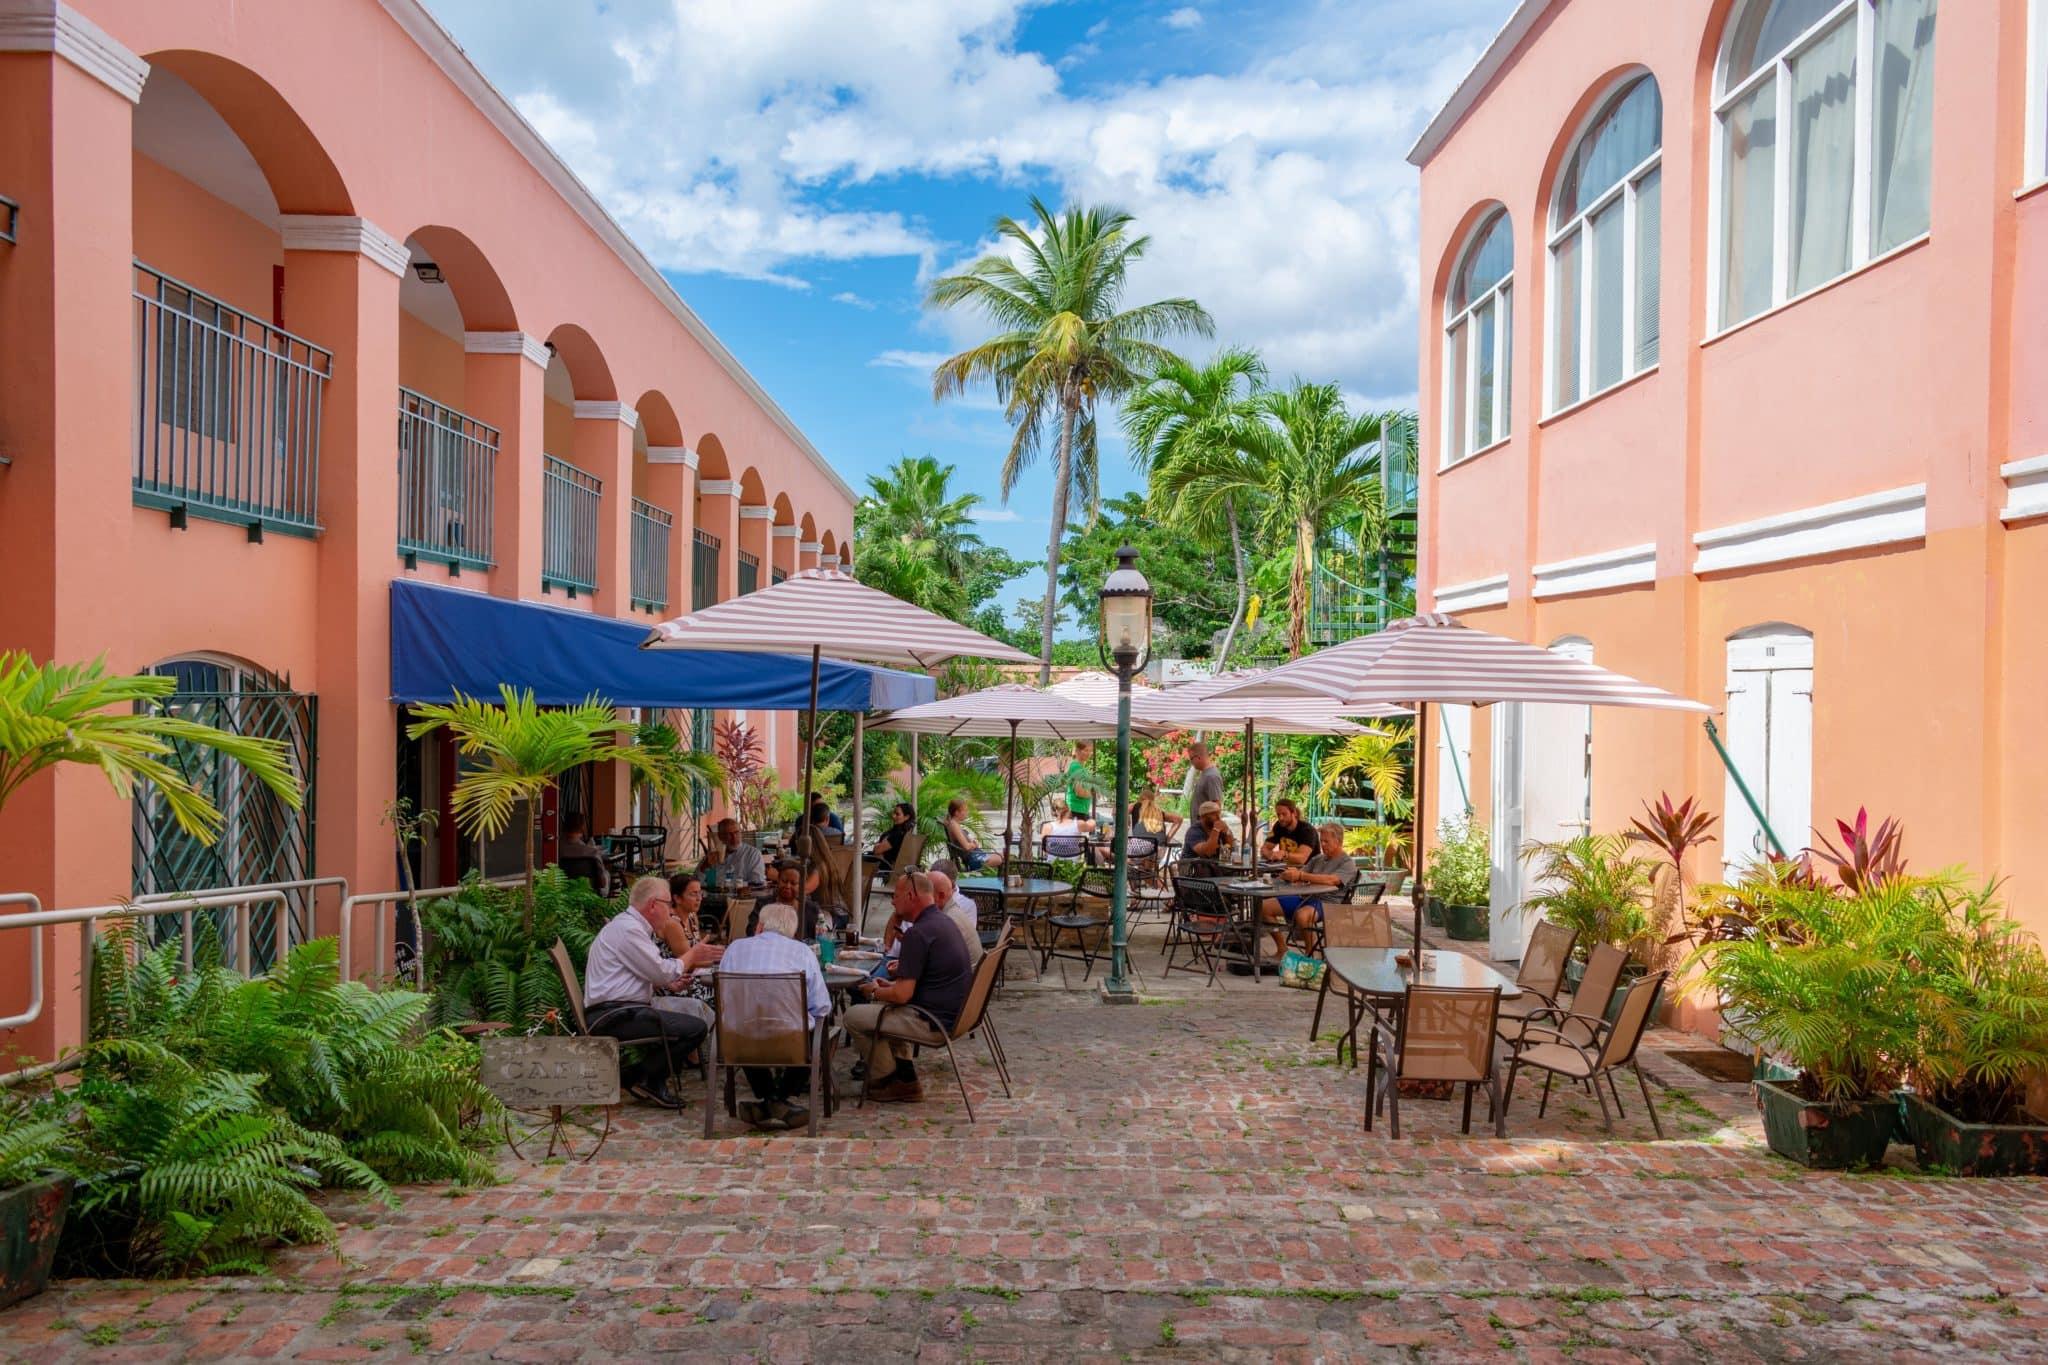 Fresh Is The Taste At Cafe Fresco St. Croix